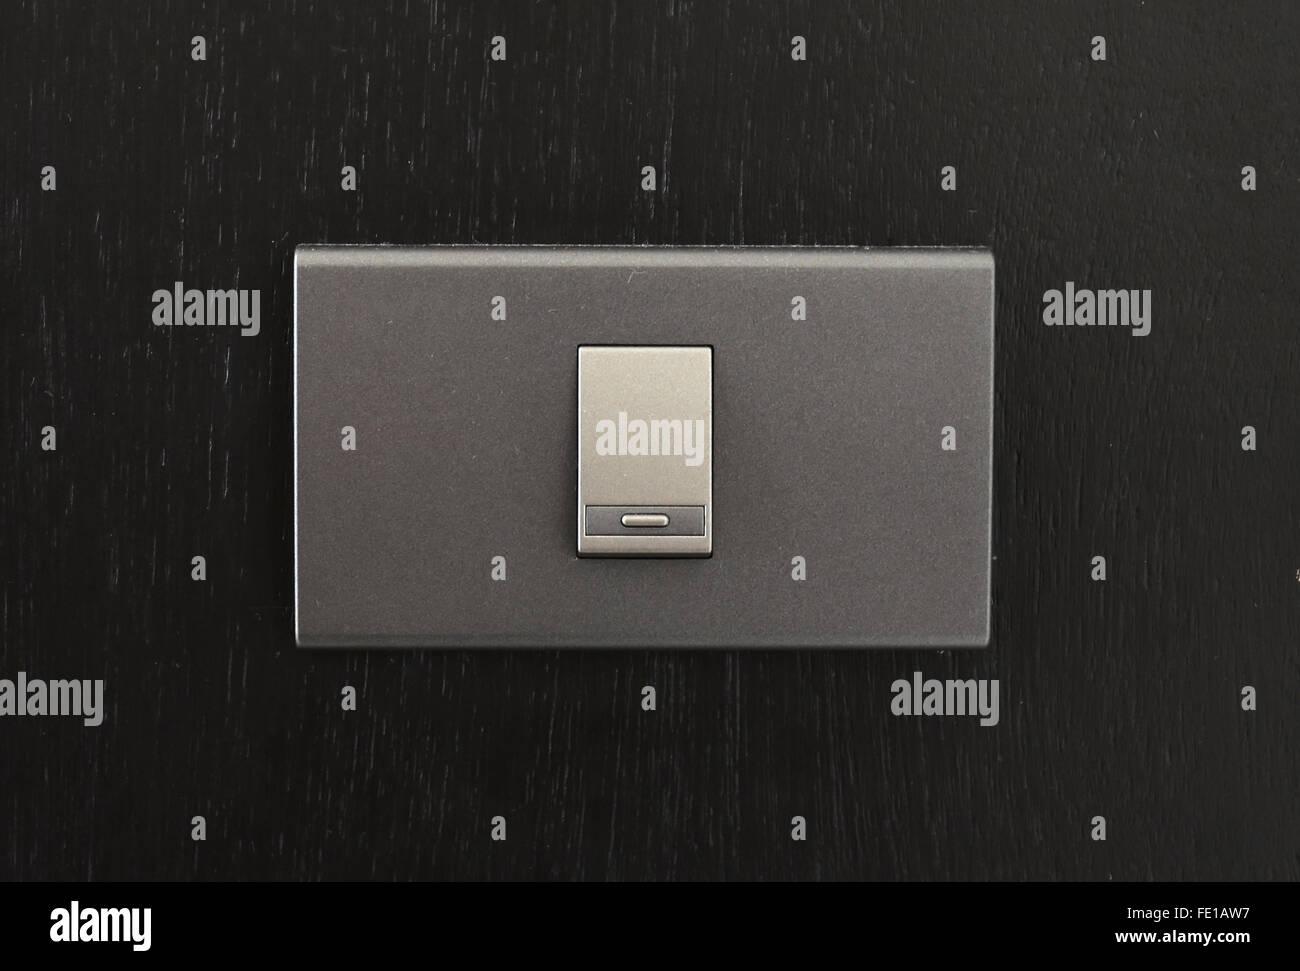 Black toggle switch on black surface - Stock Image